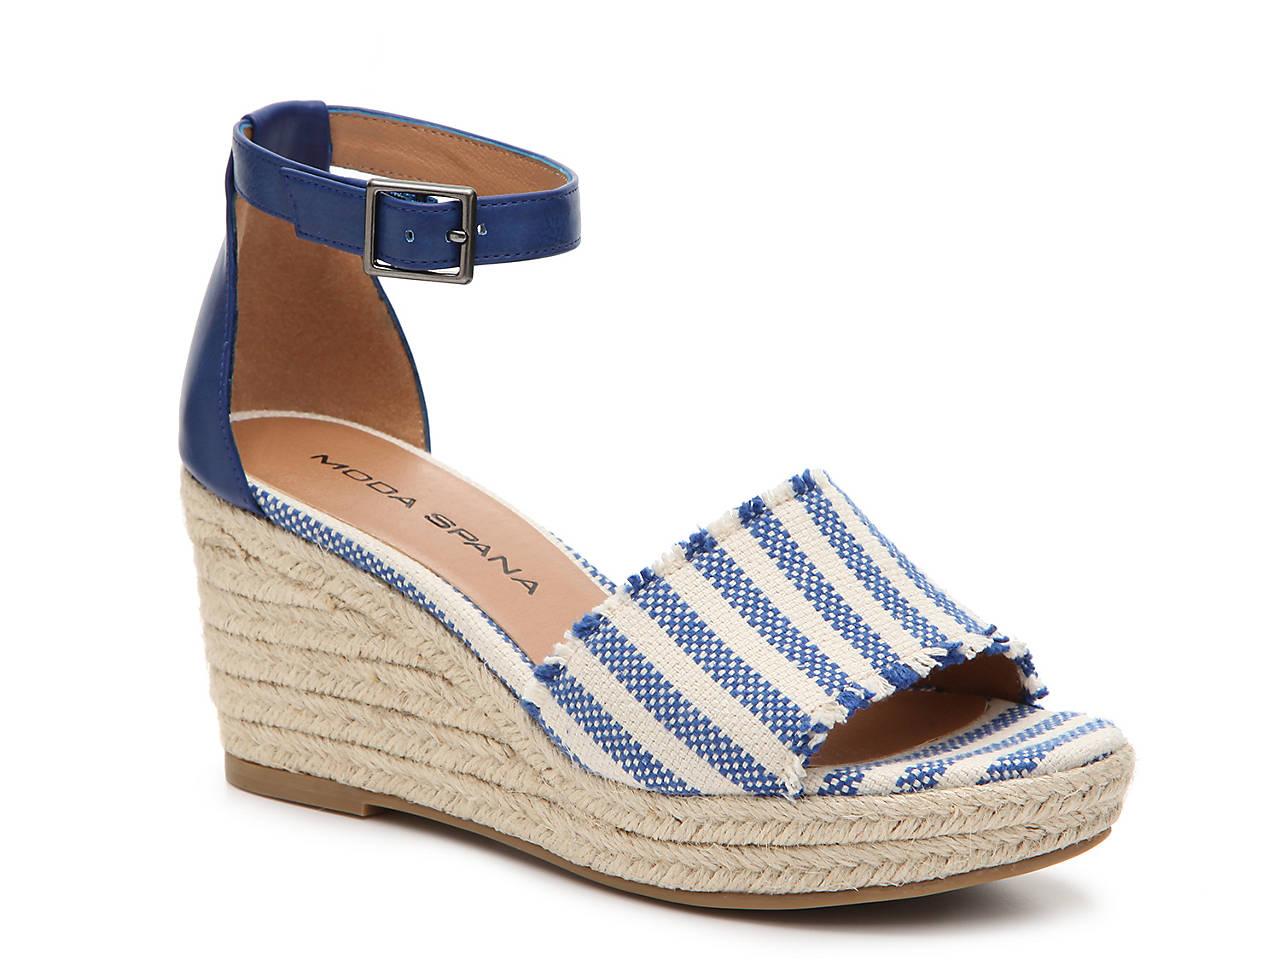 22b0c434d319 Moda Spana Kassie Espadrille Wedge Sandal Women s Shoes